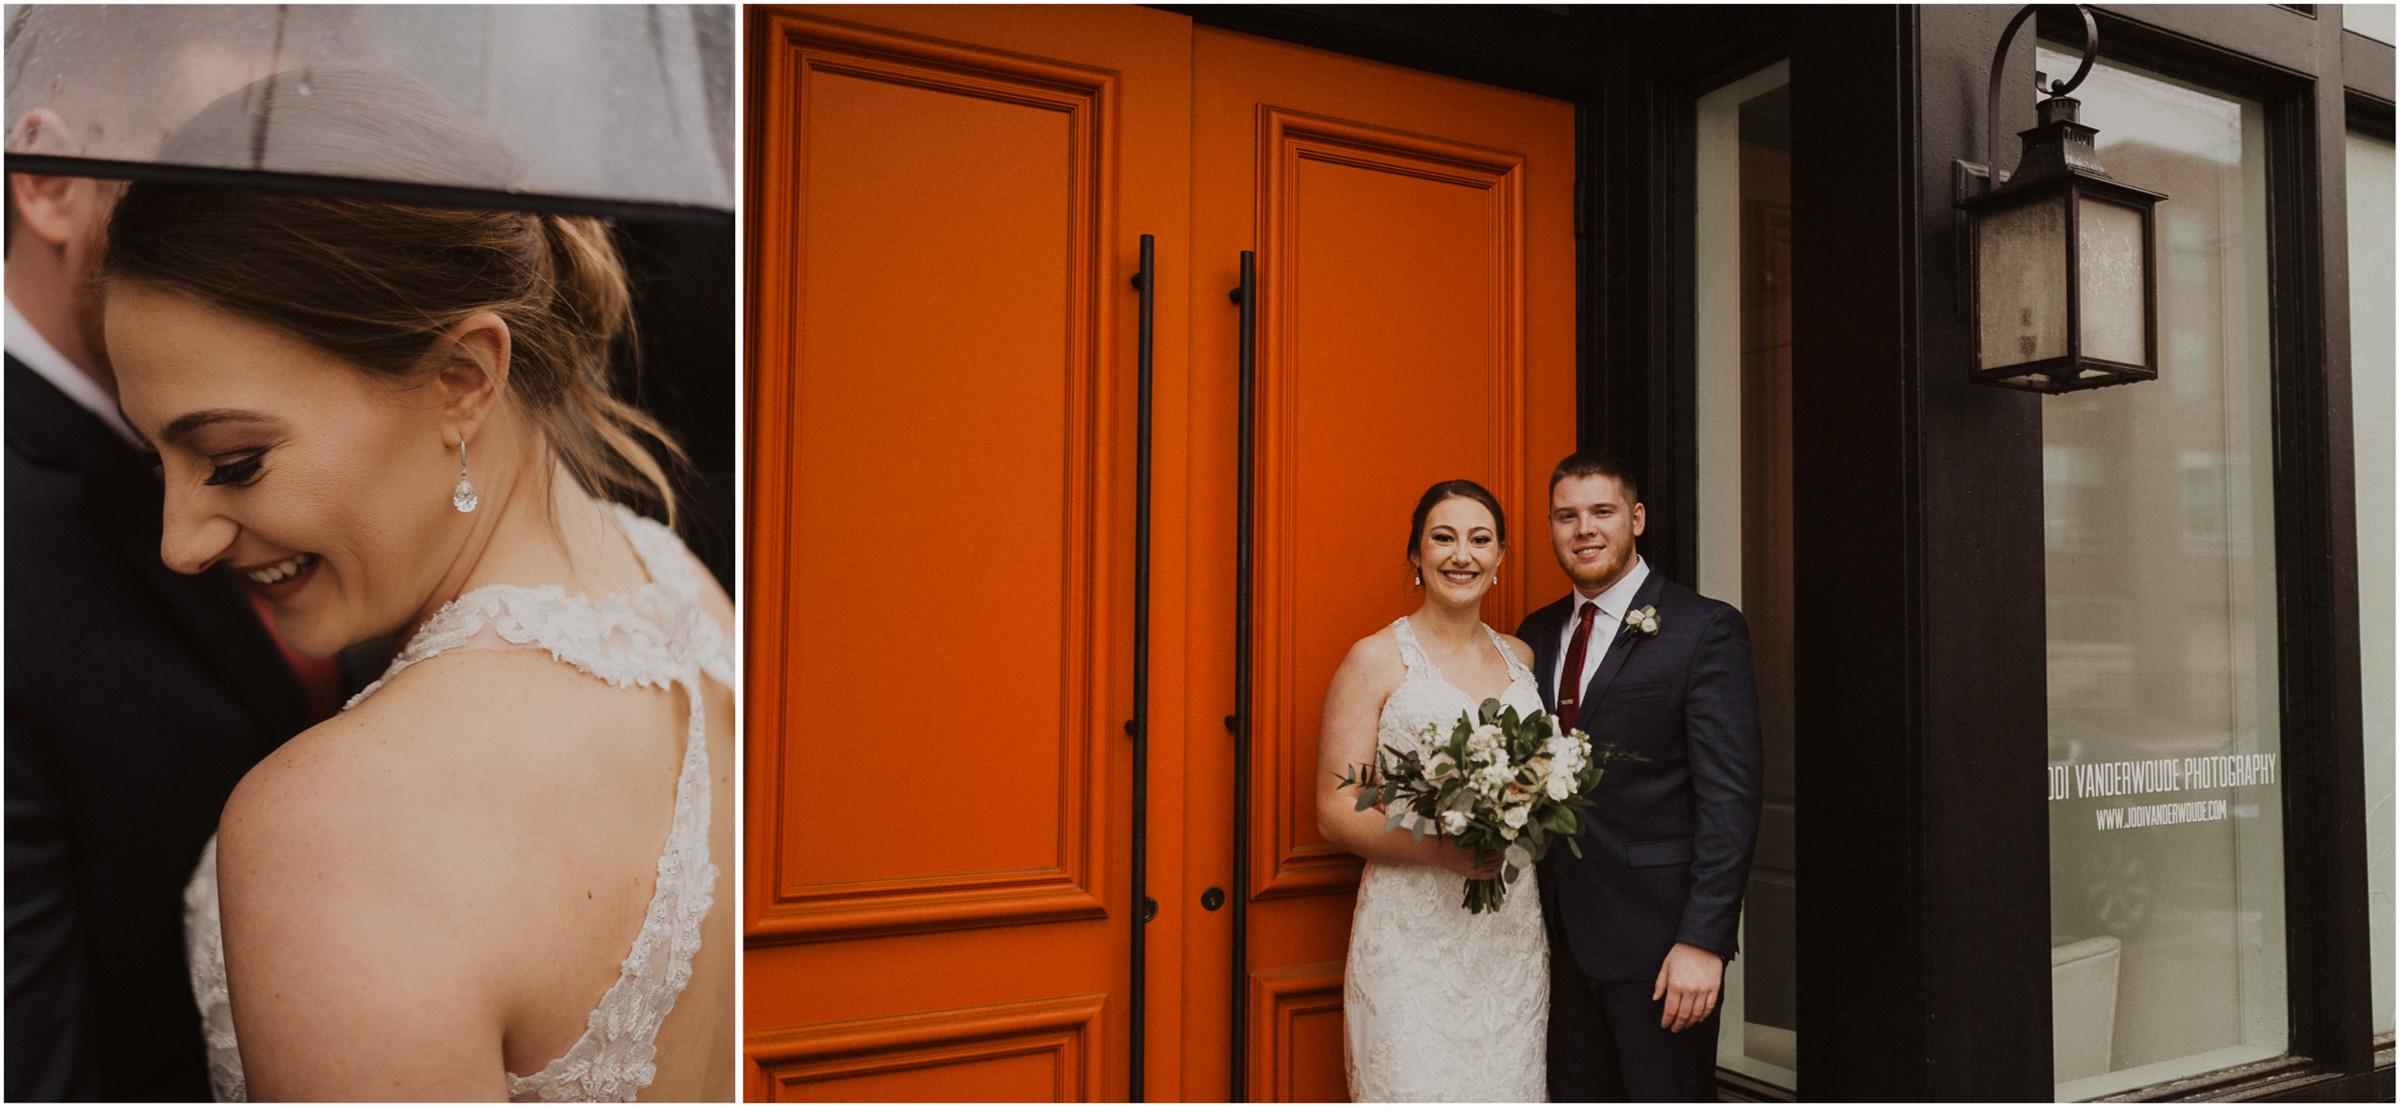 alyssa barletter photography 2016 main kansas city wedding rainy day photographer grace and justin magott-26.jpg